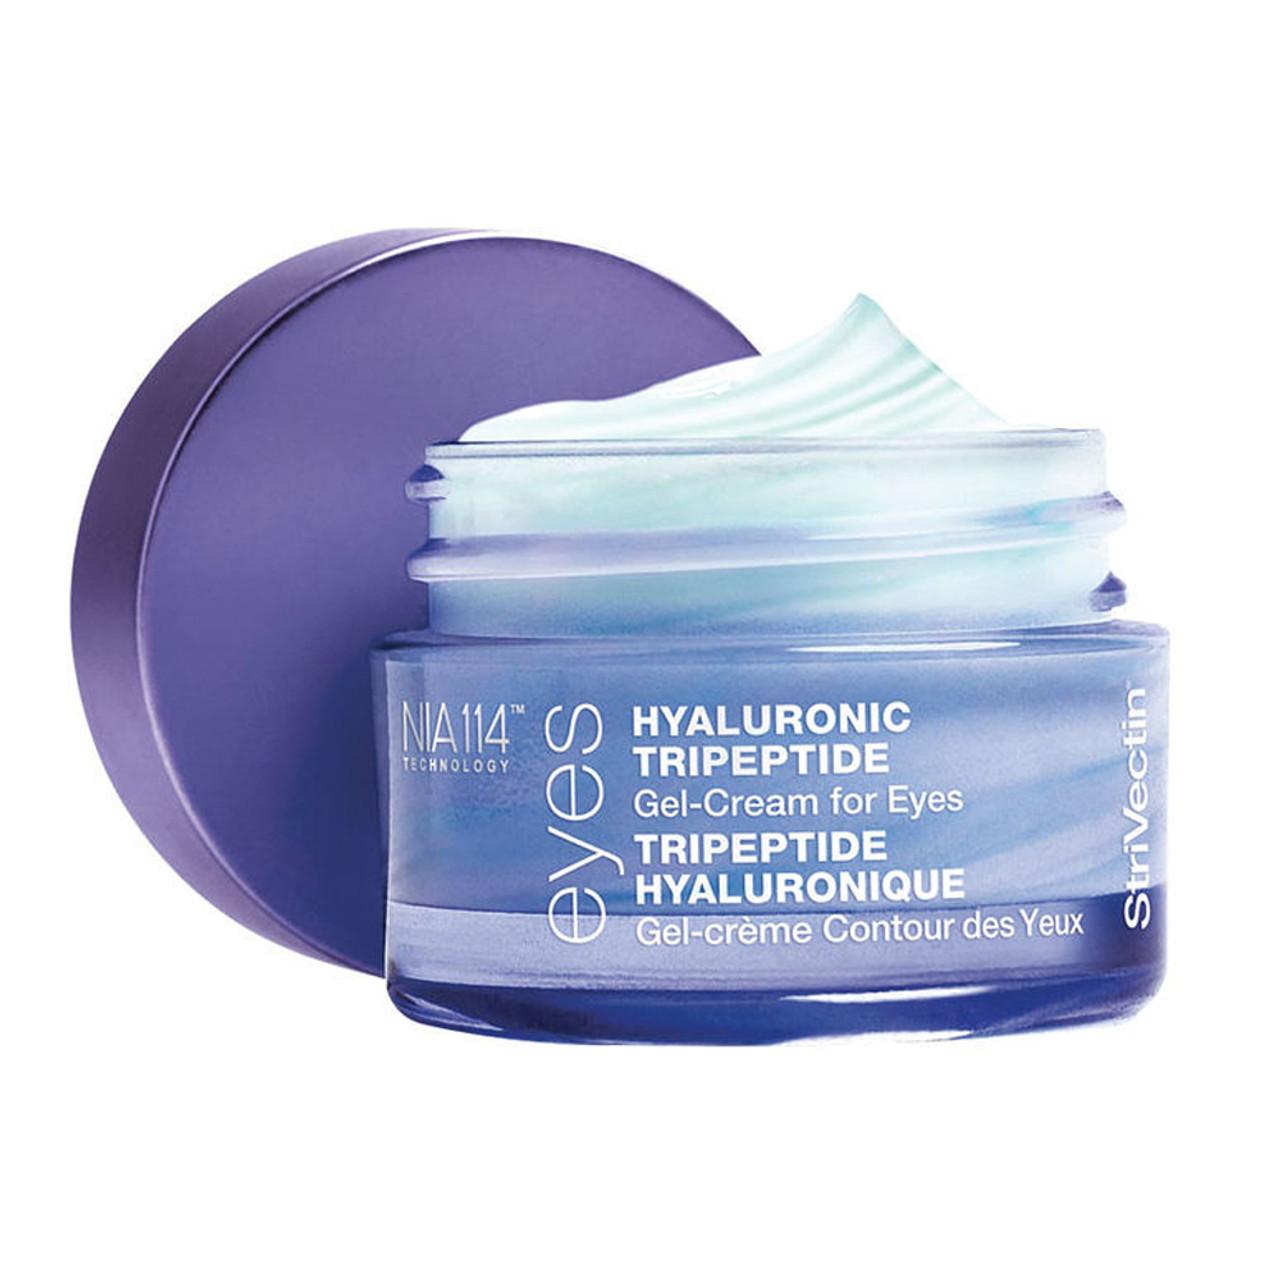 StriVectin Hyaluronic Tripeptide Gel-Cream for Eyes BeautifiedYou.com